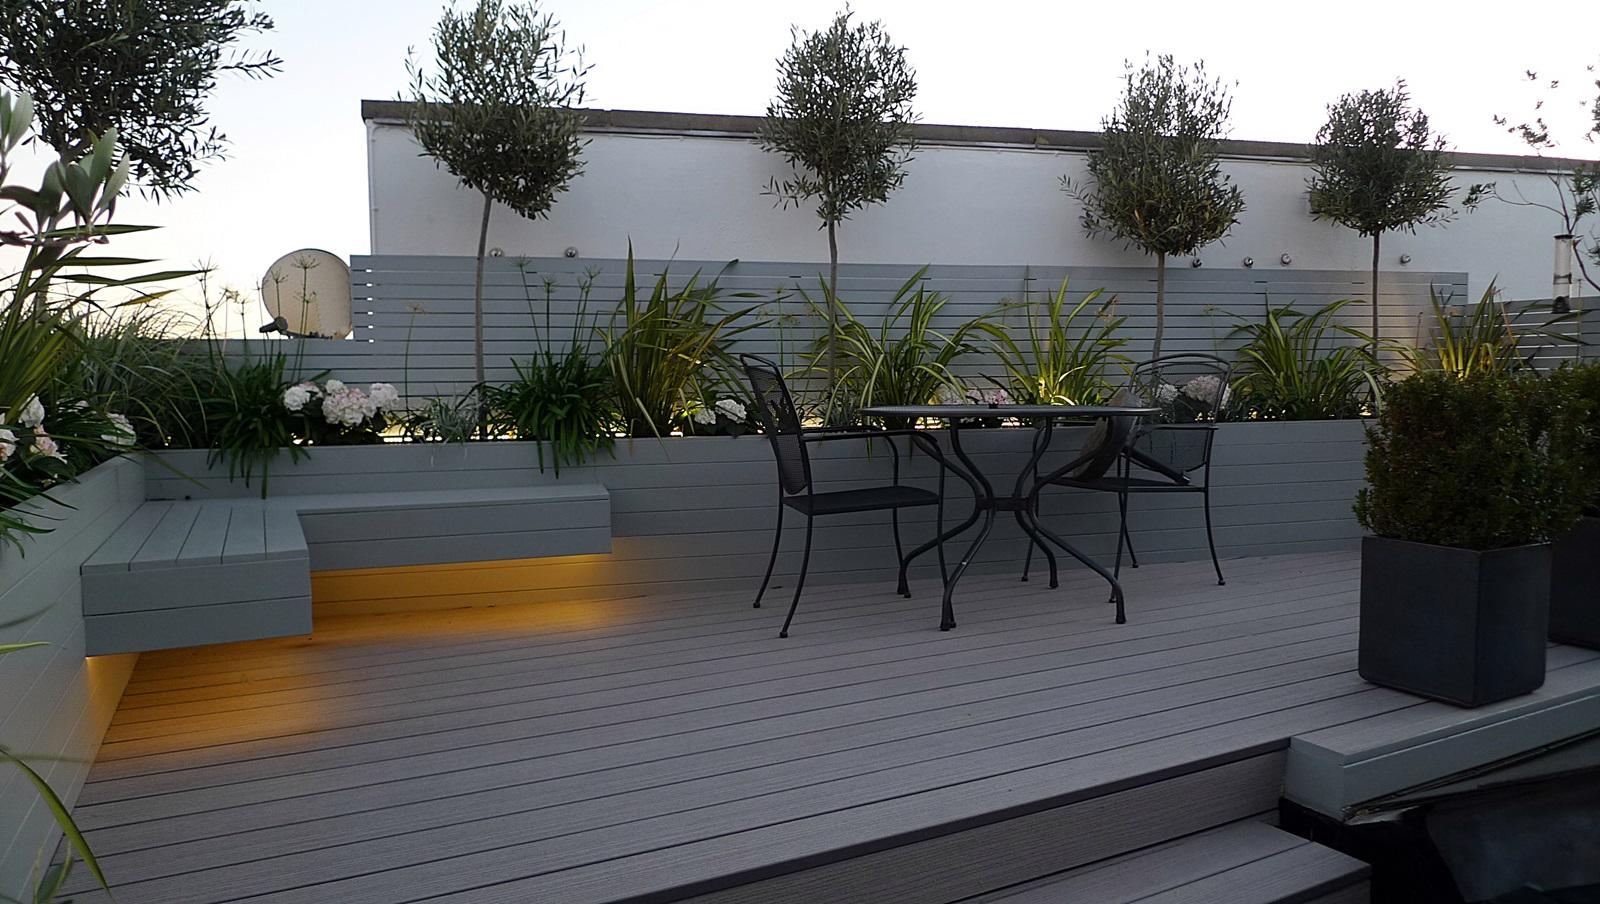 Roof Terrace Modern Garden Design - London Garden Blog on Modern Back Garden Ideas id=14510